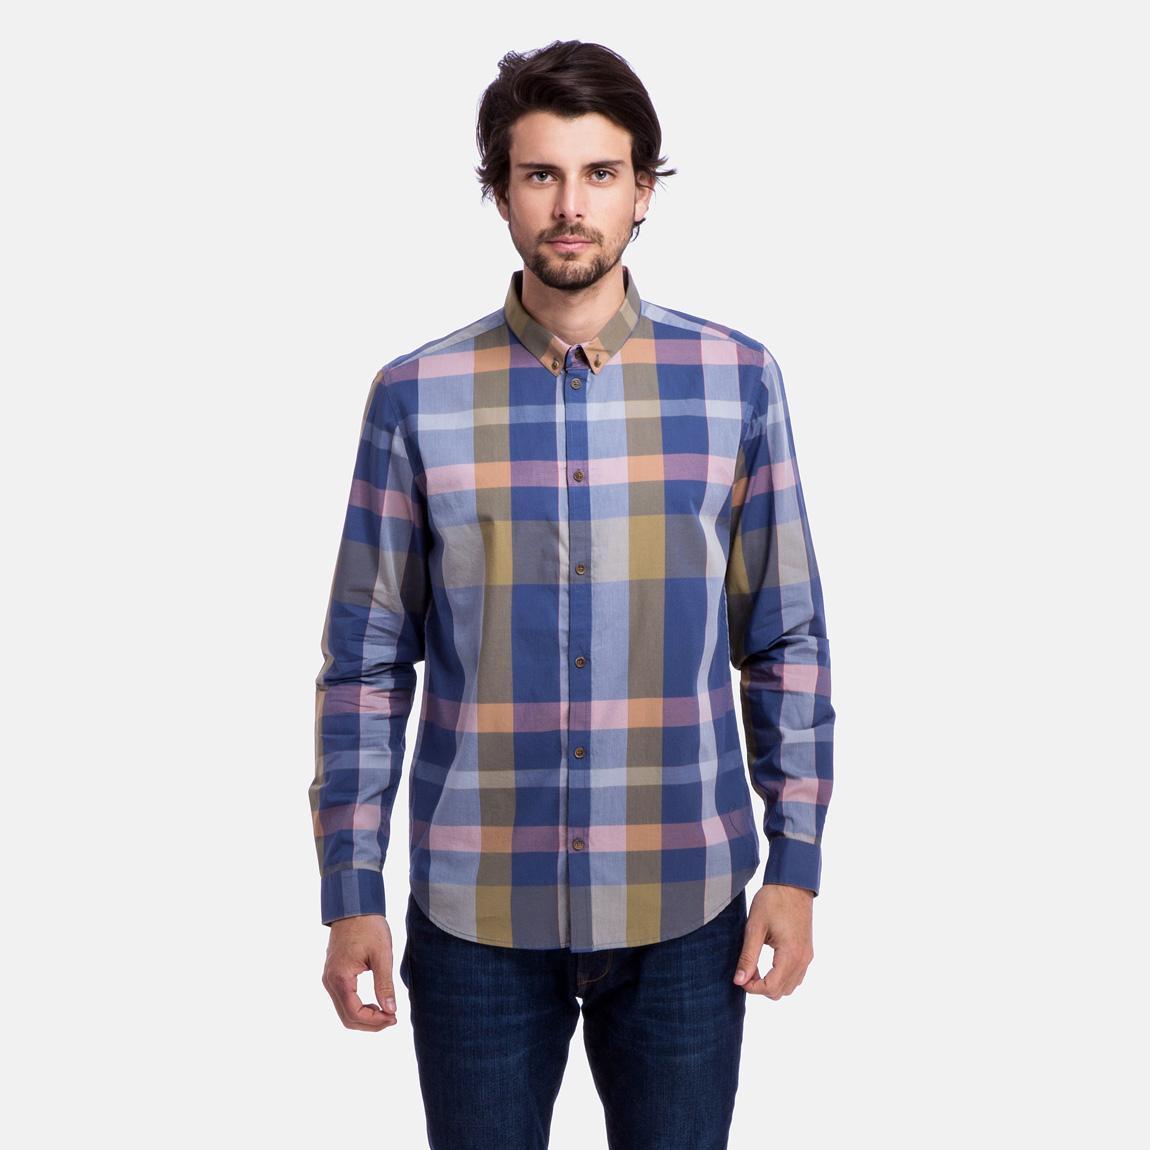 Damon shirt grey peach cheap monday shirts for Domon men s underwear